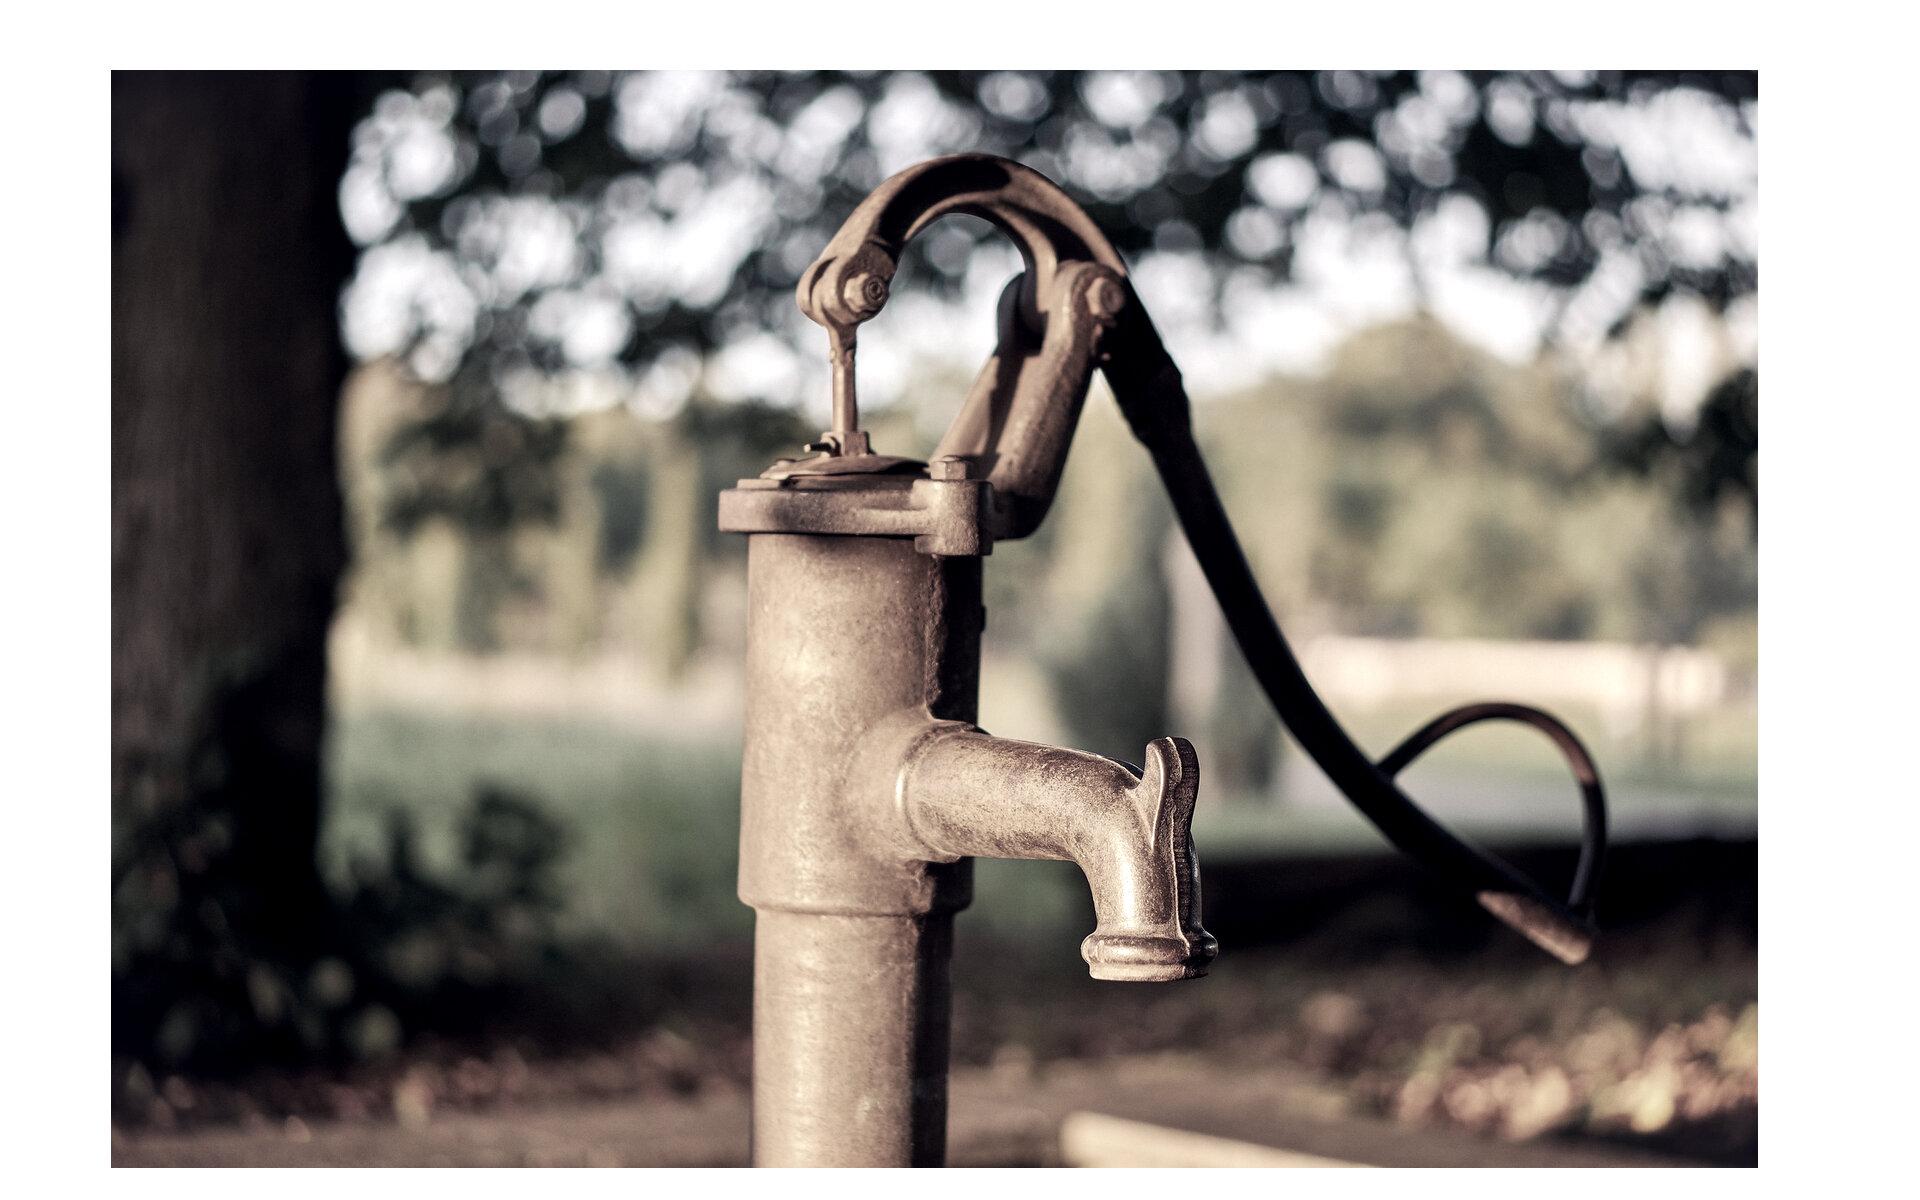 Carnation Filter - Water pump.jpg